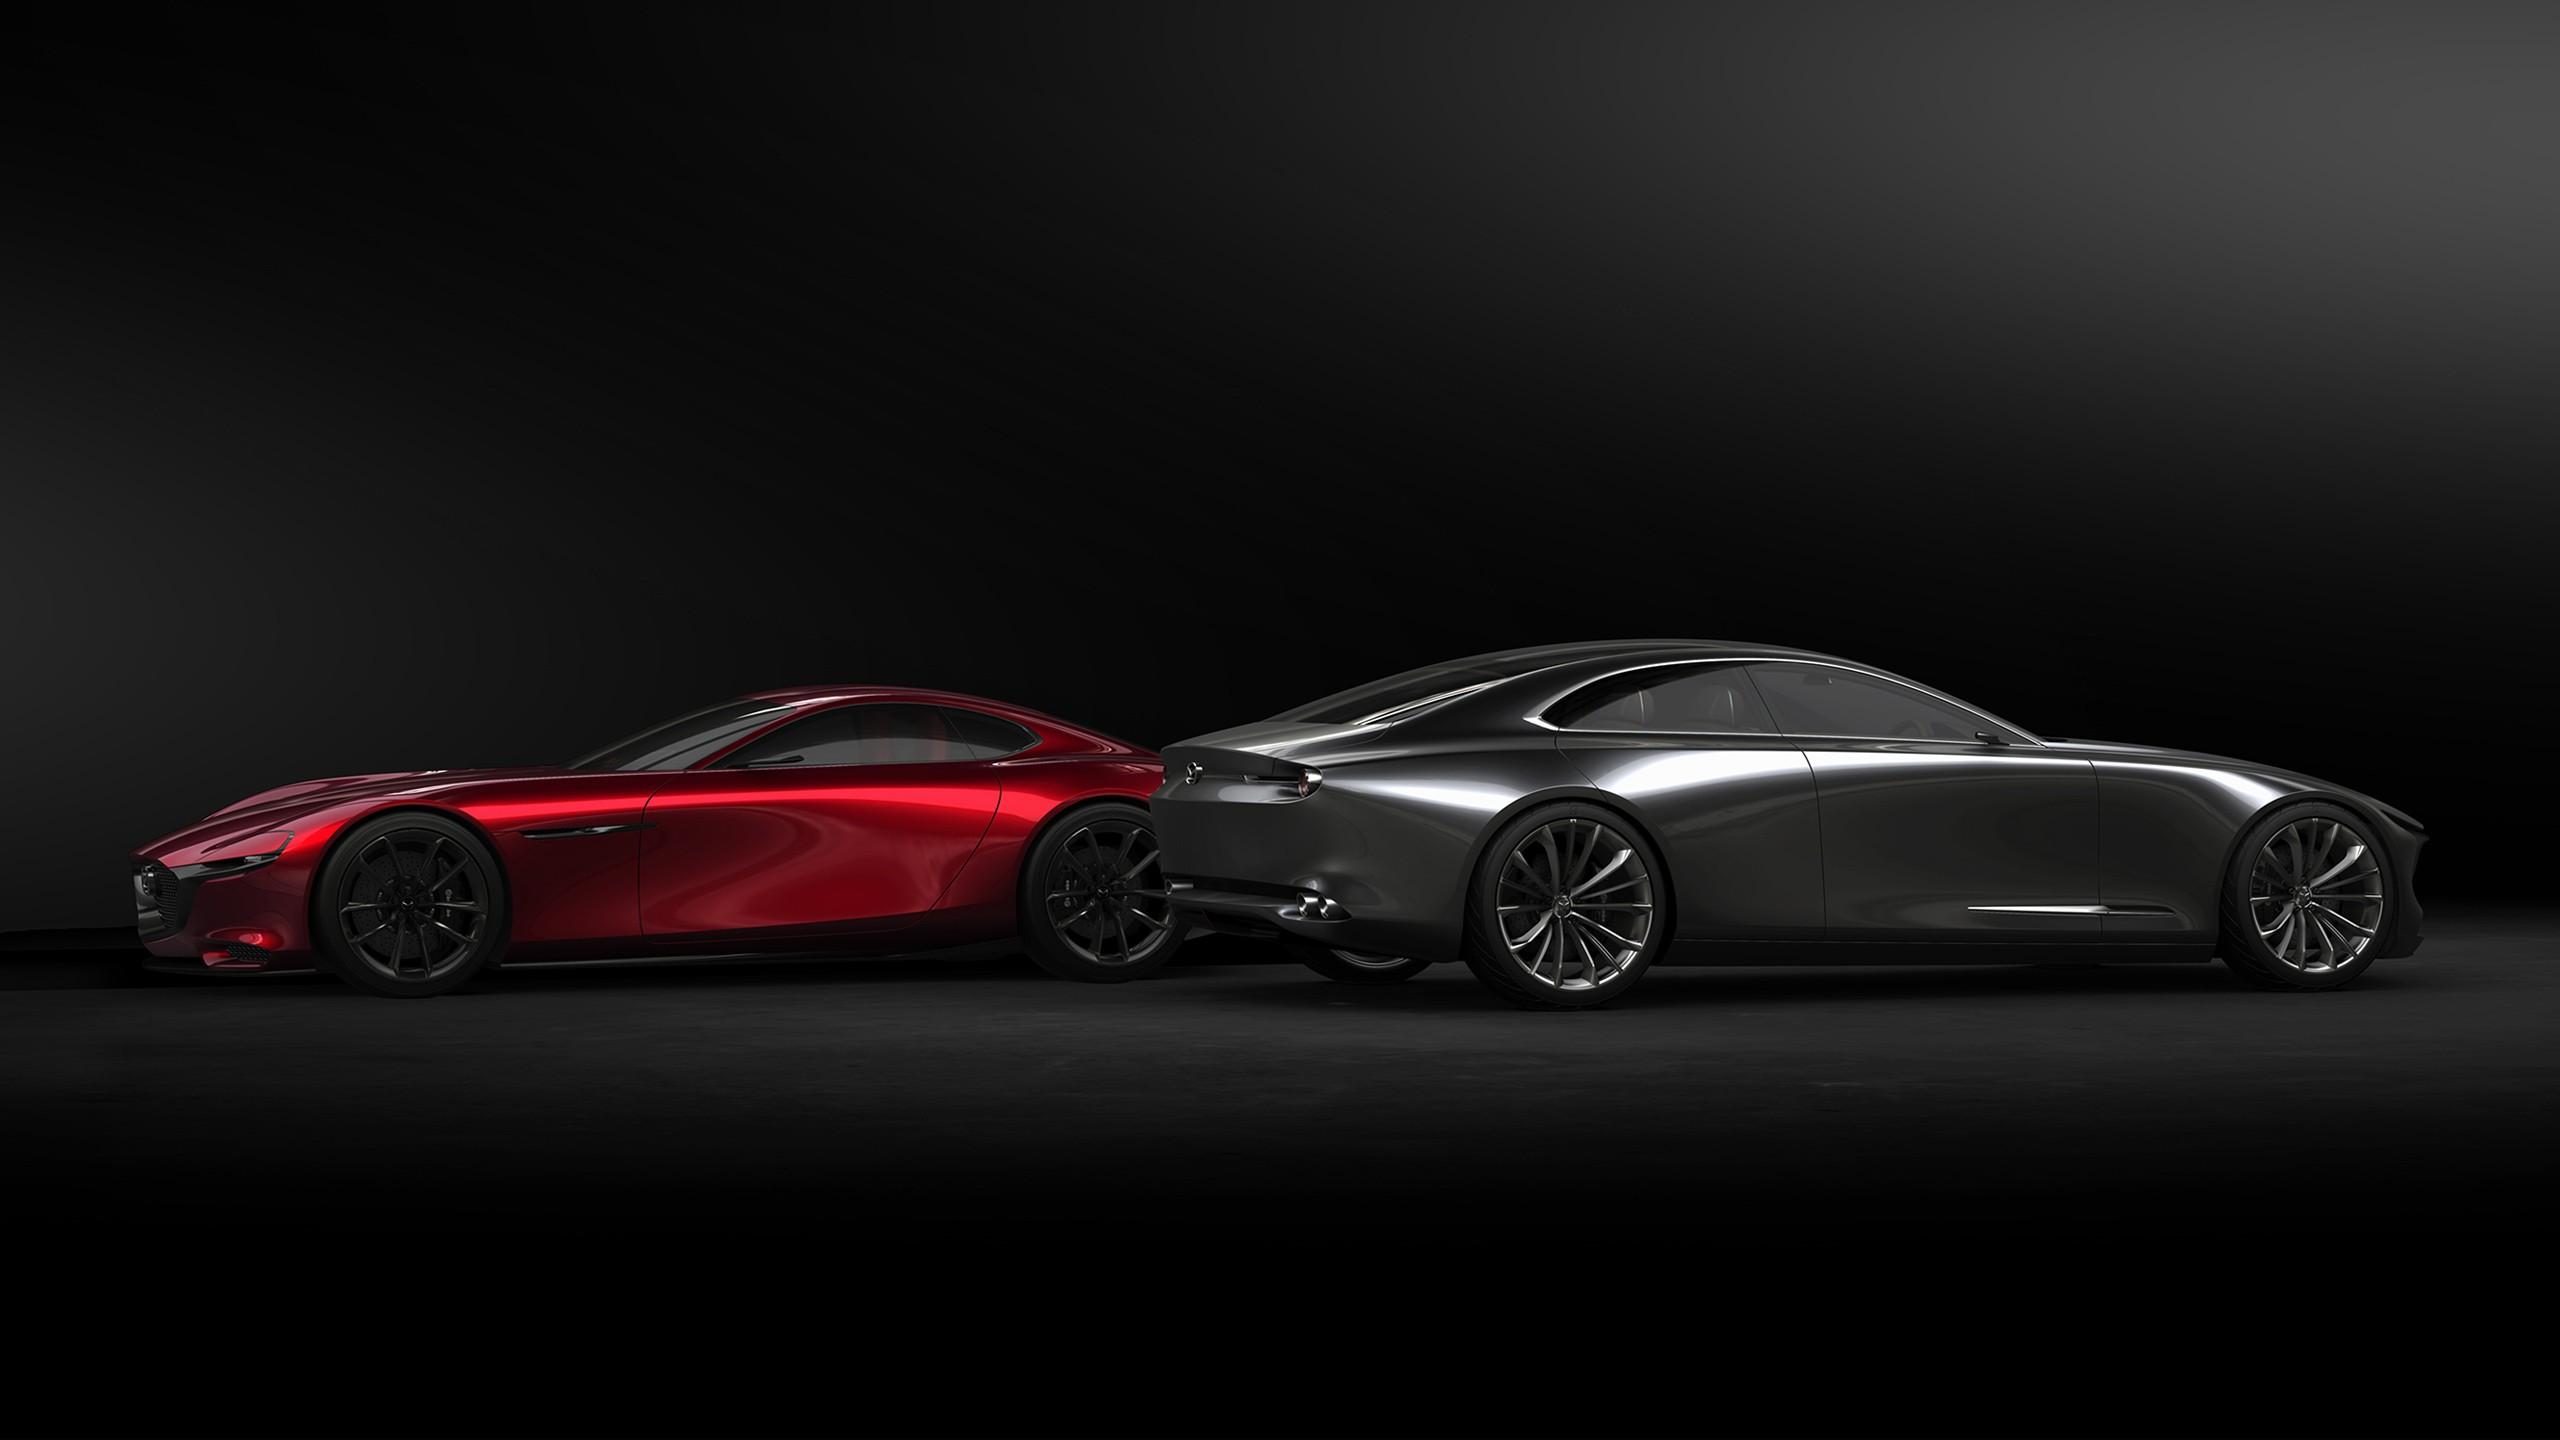 Mazda RX Vision Mazda Vision Coupe Concept Cars Wallpaper ...